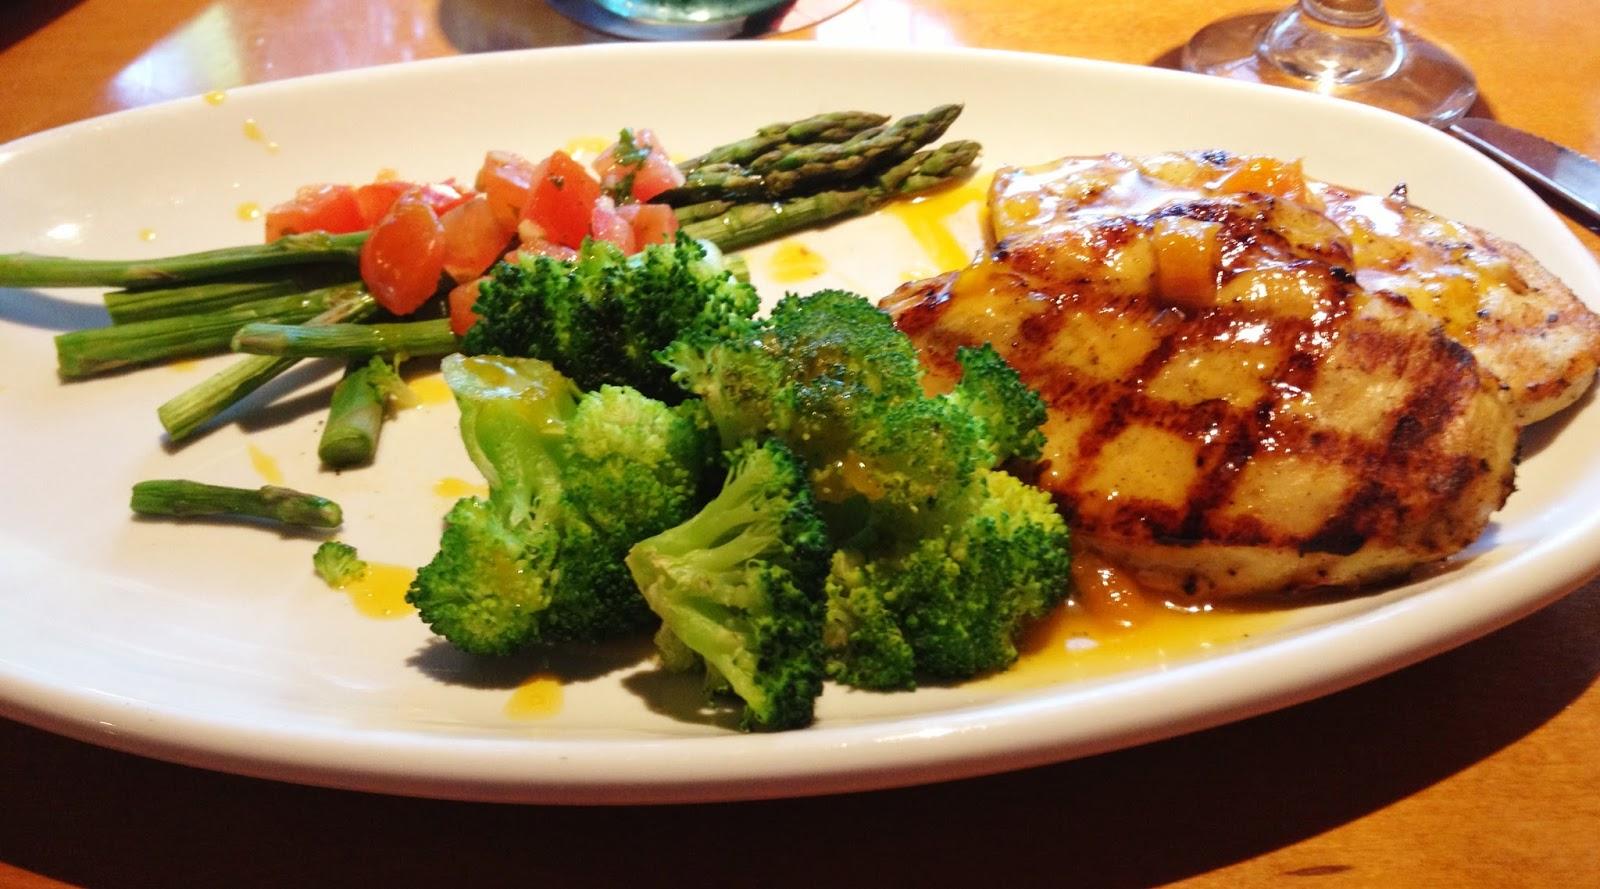 Restaurant Healthy Olive Garden Extreme Health Over